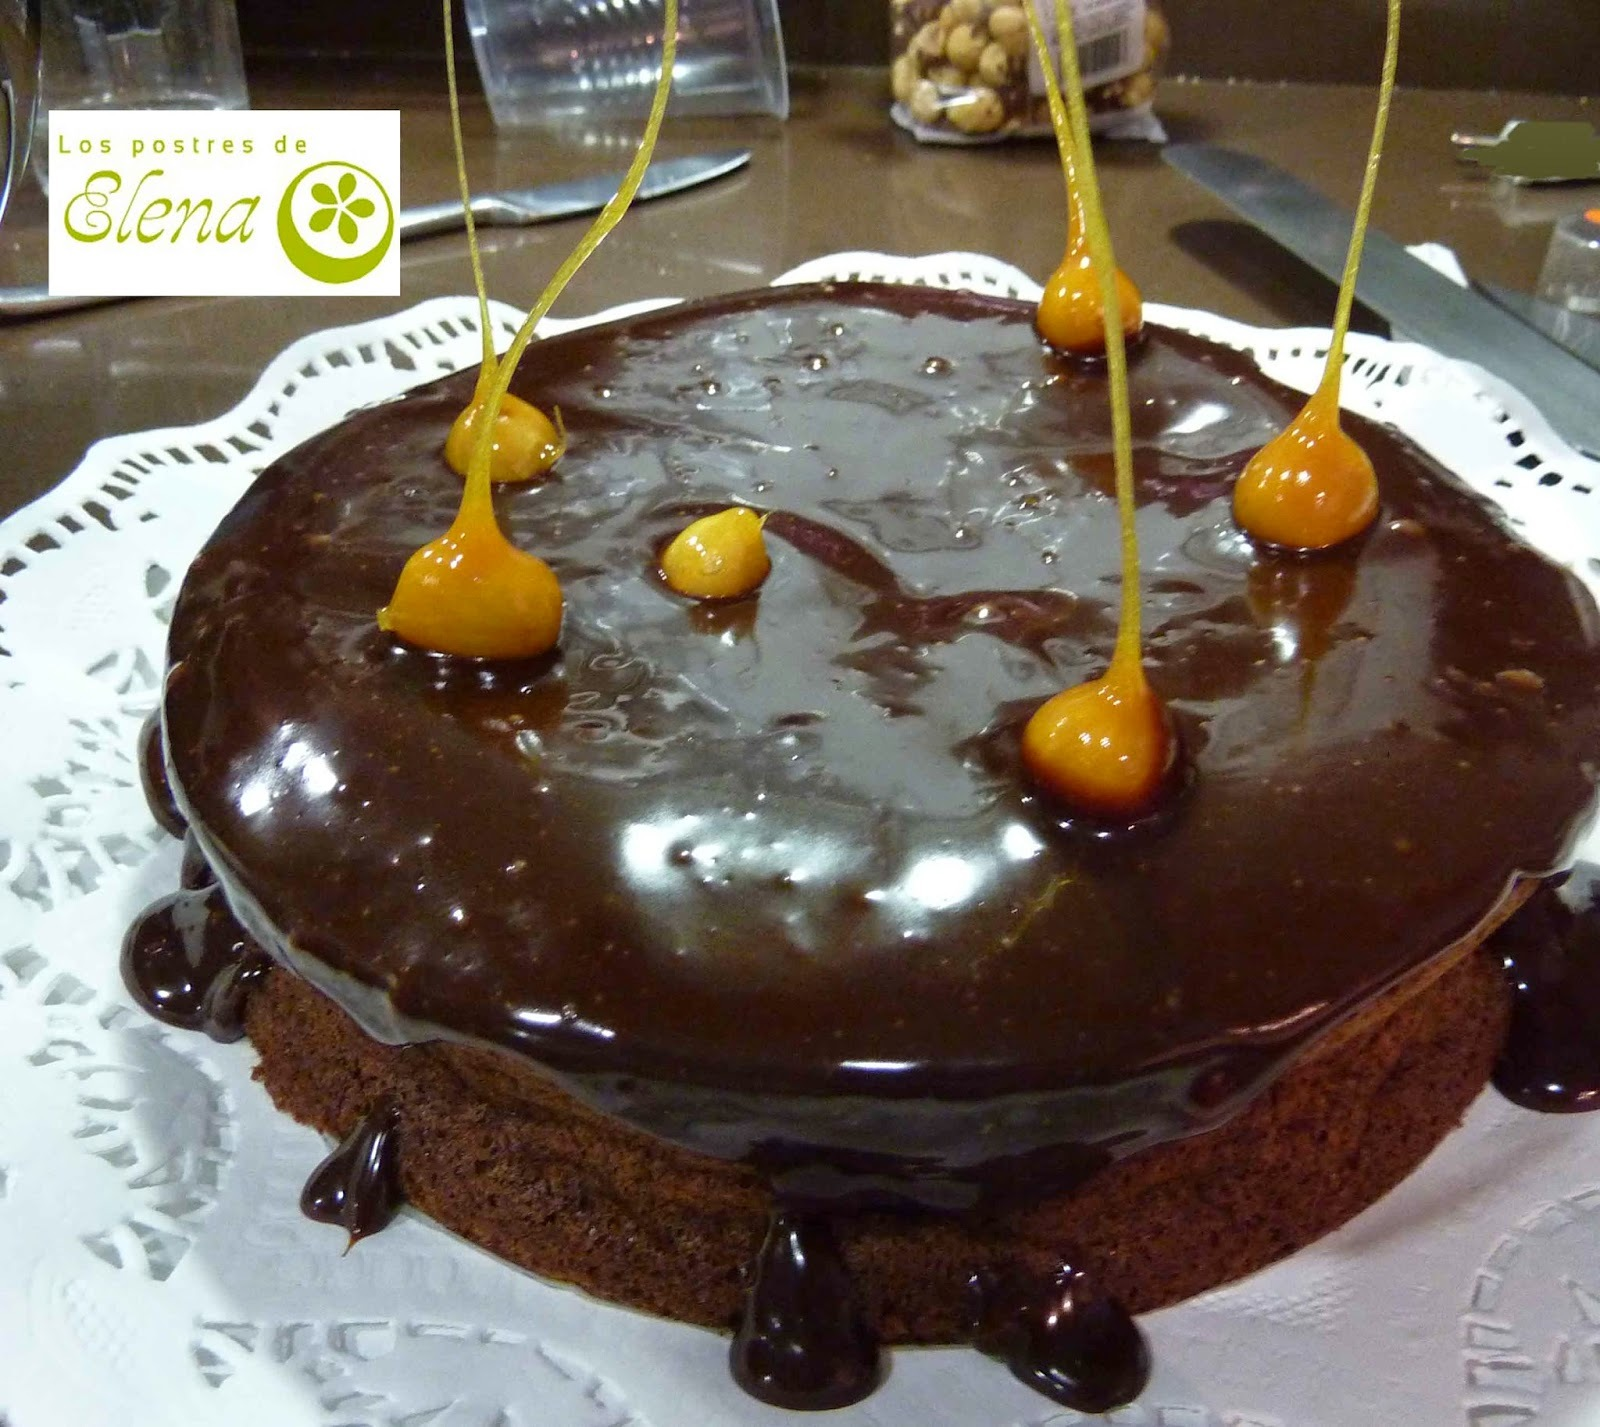 Tarta de chocolate con avellanas caramelizadas.